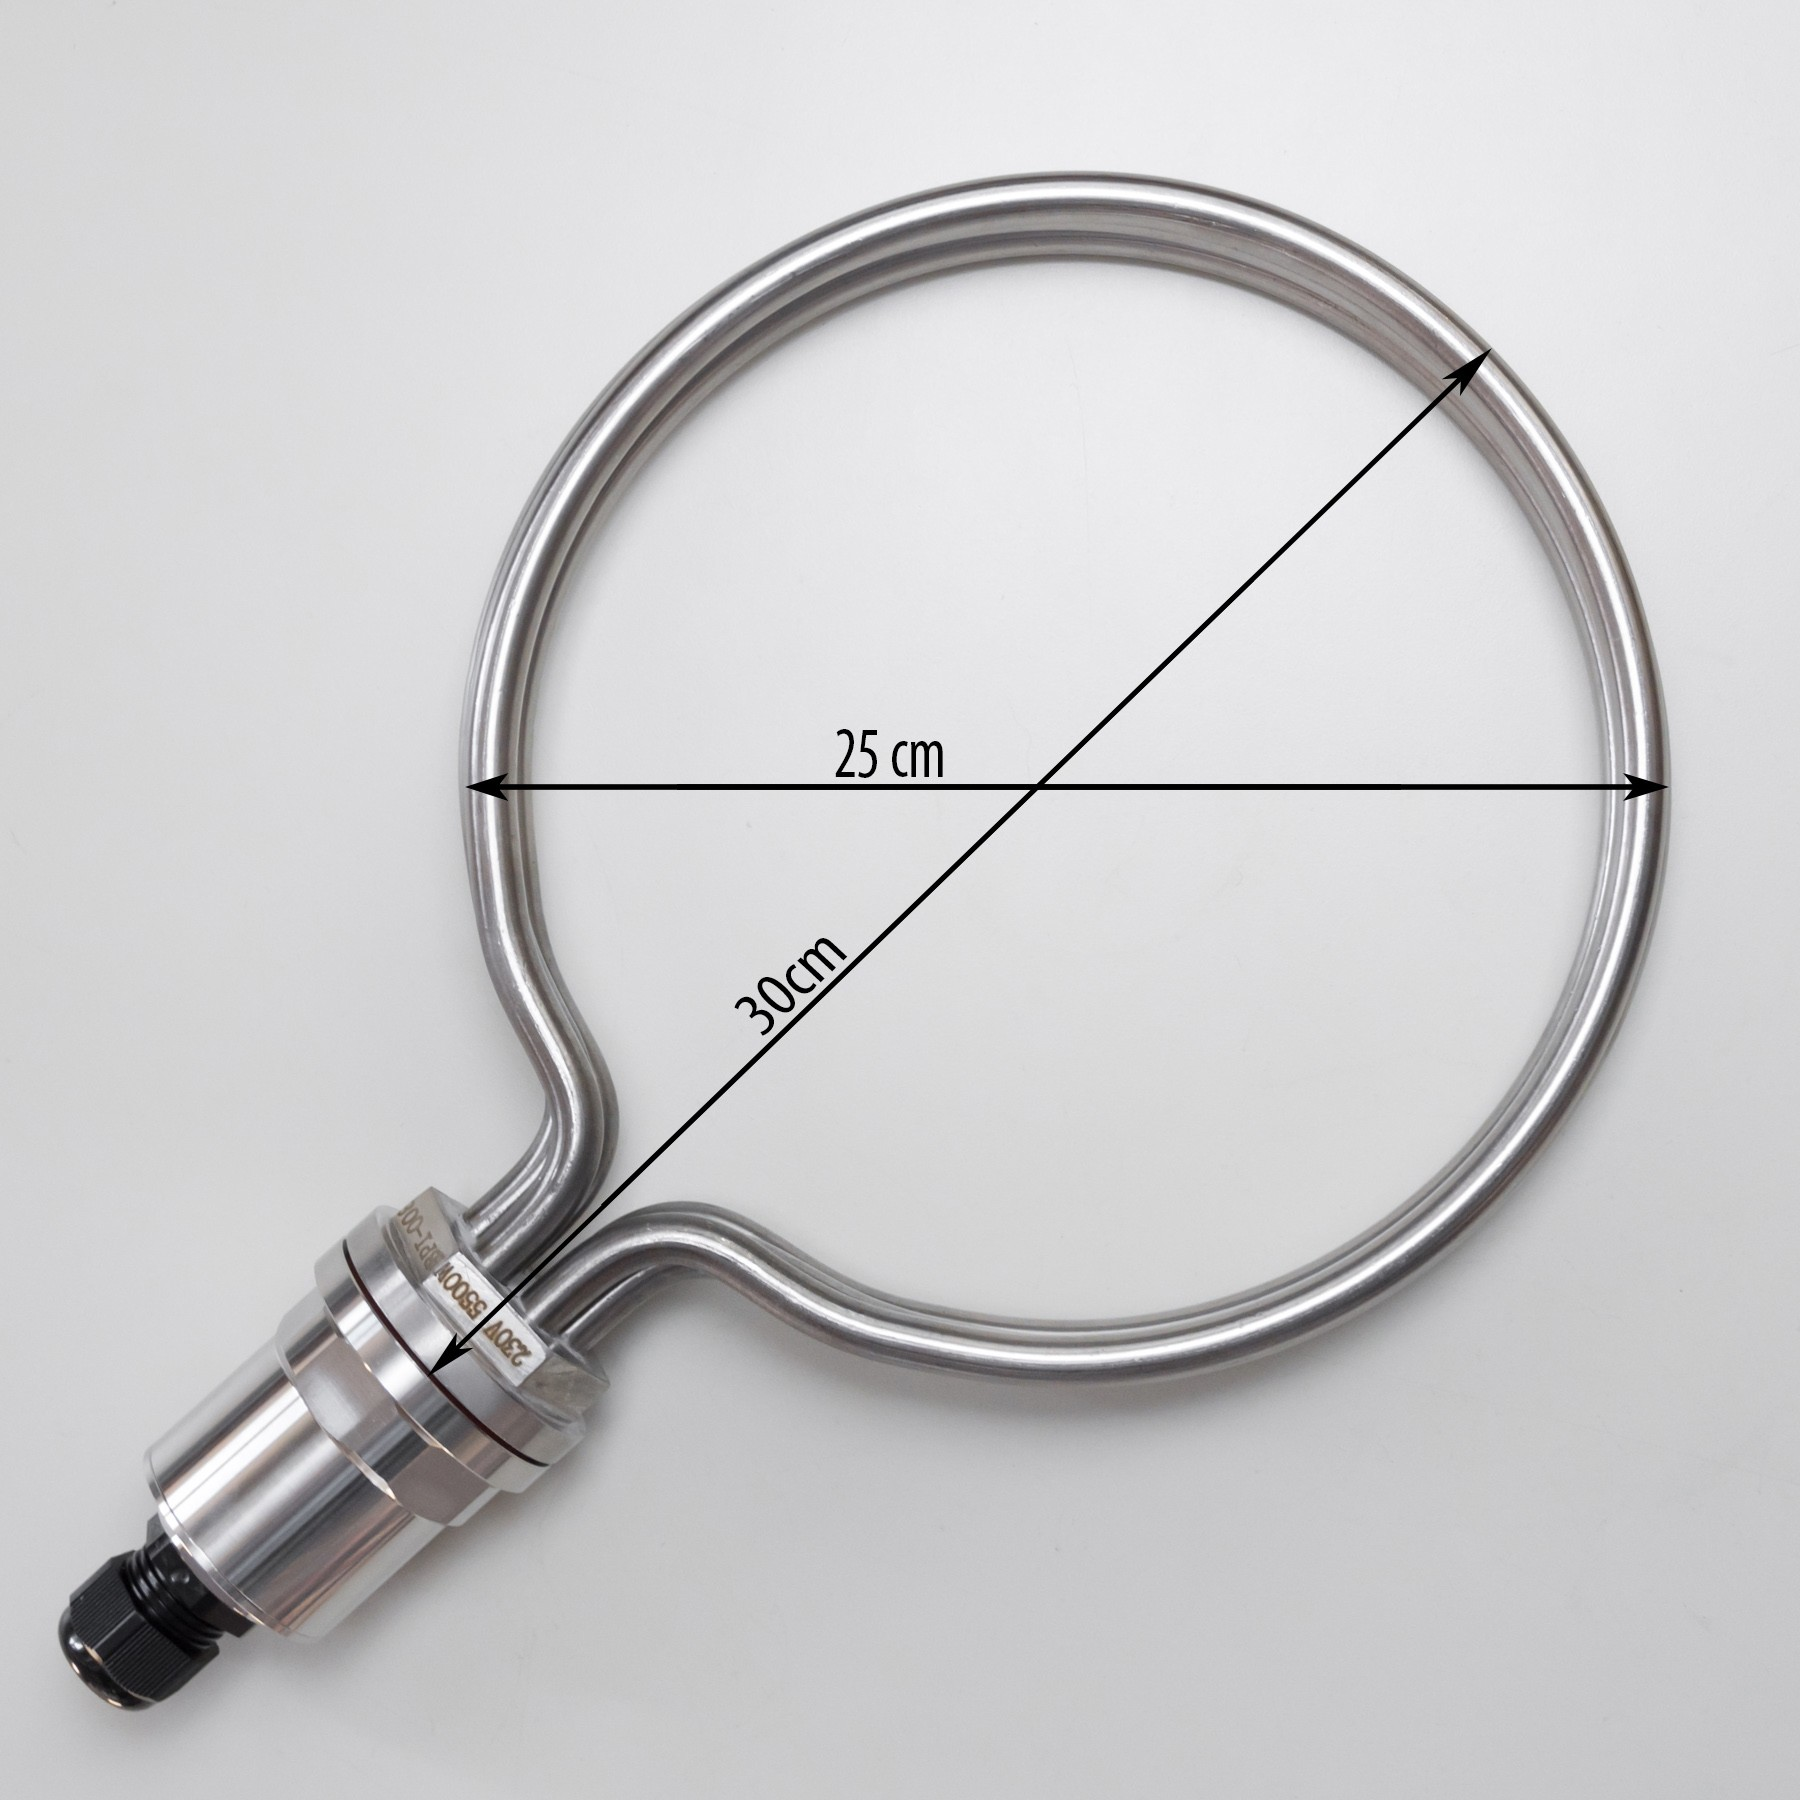 Round Heating Element for brewing, 25cm diameter, 5500W